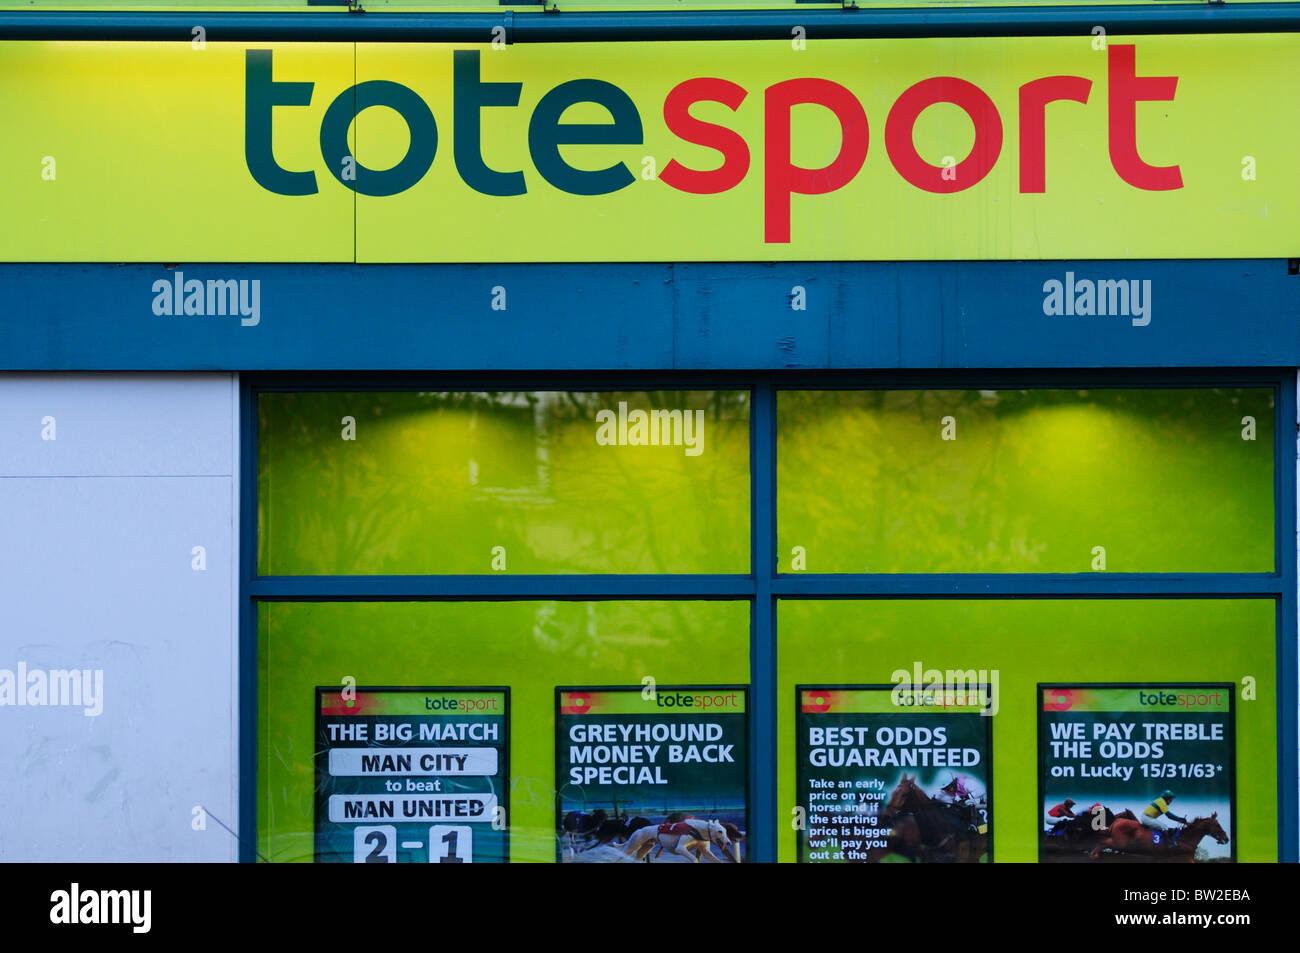 Totesport mobile betting station sports betting jargon